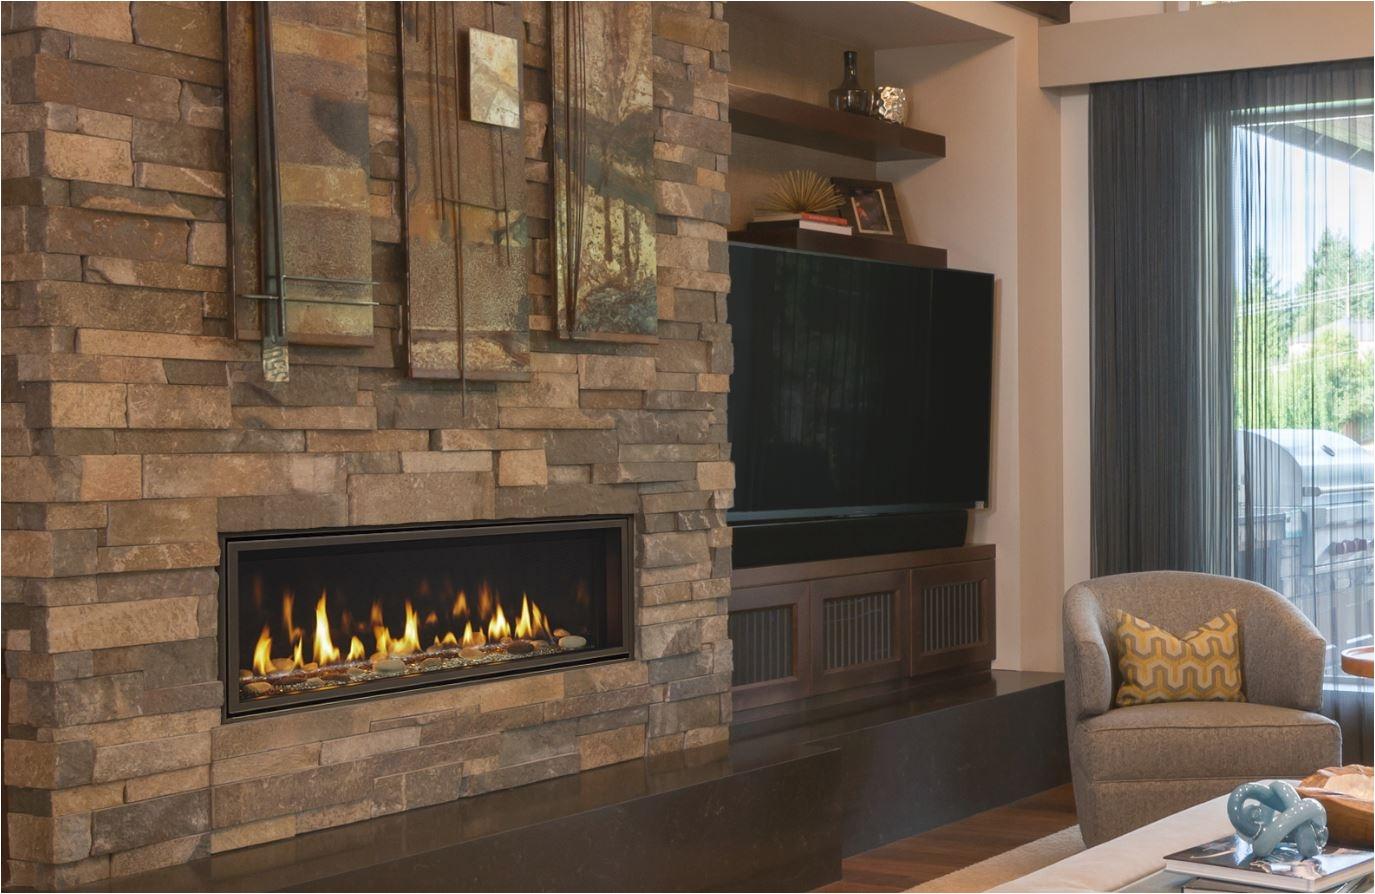 30000 btu fireplace inspirational majestic echelon direct vent gas fireplace inseason fireplaces